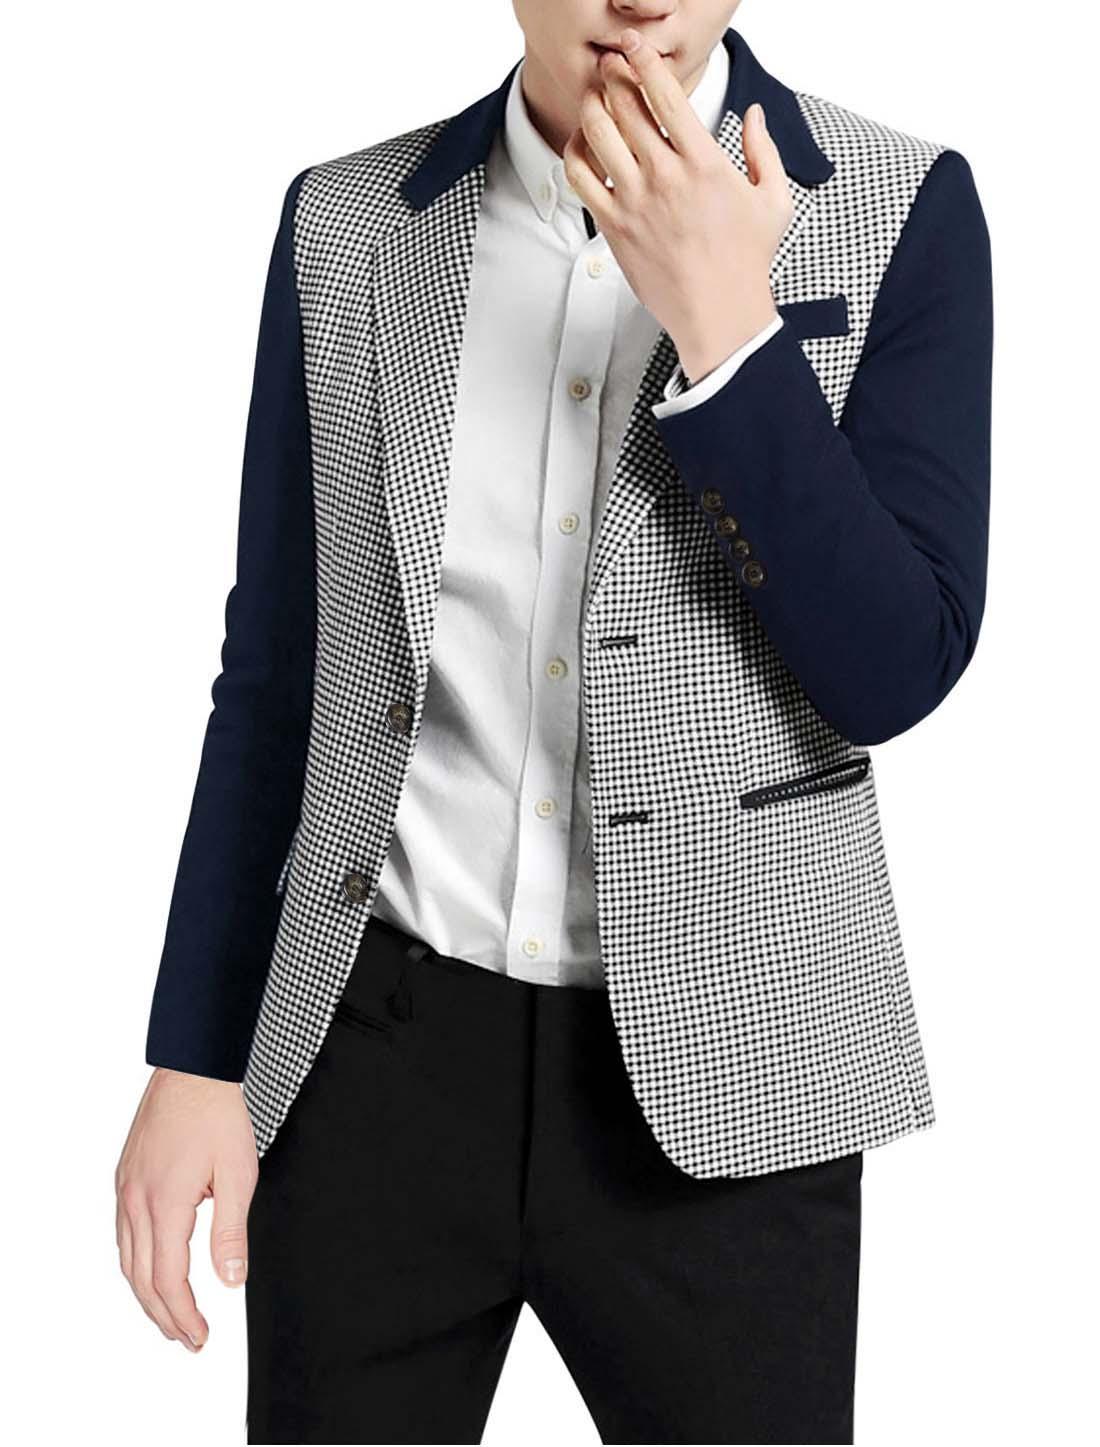 Men Geometric Pattern Long Sleeve Ribbed Hem Knit Shirt Navy Blue White S